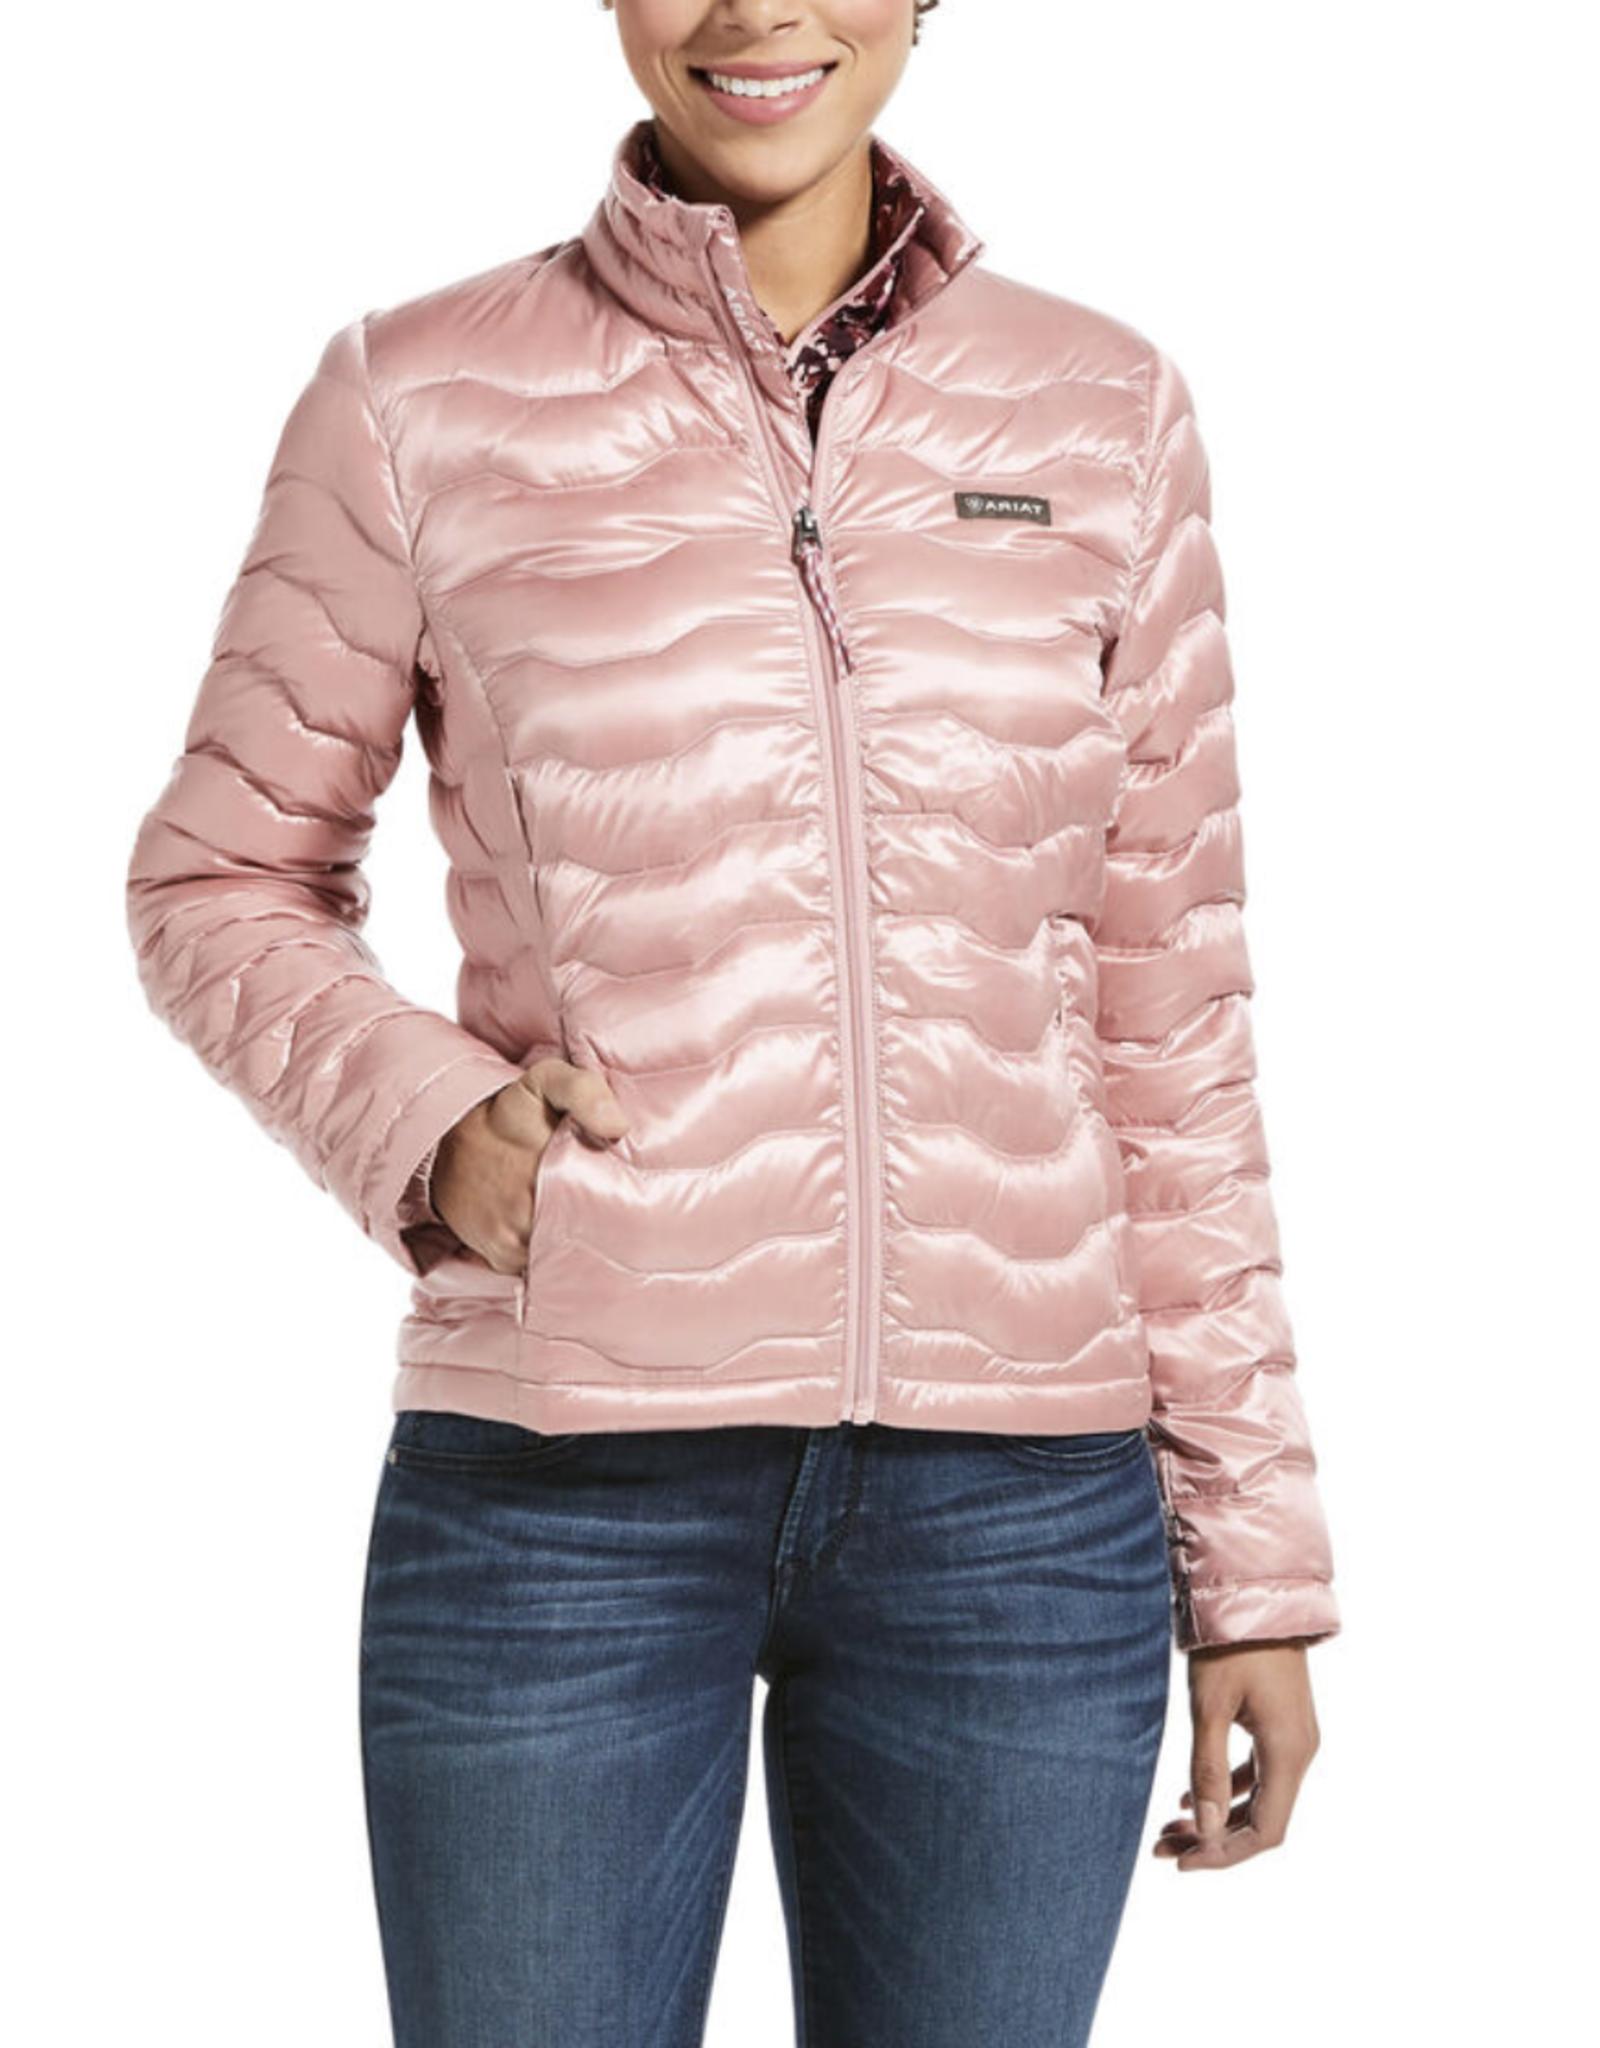 Ariat Ladies' Ideal Down 3.0 Jacket